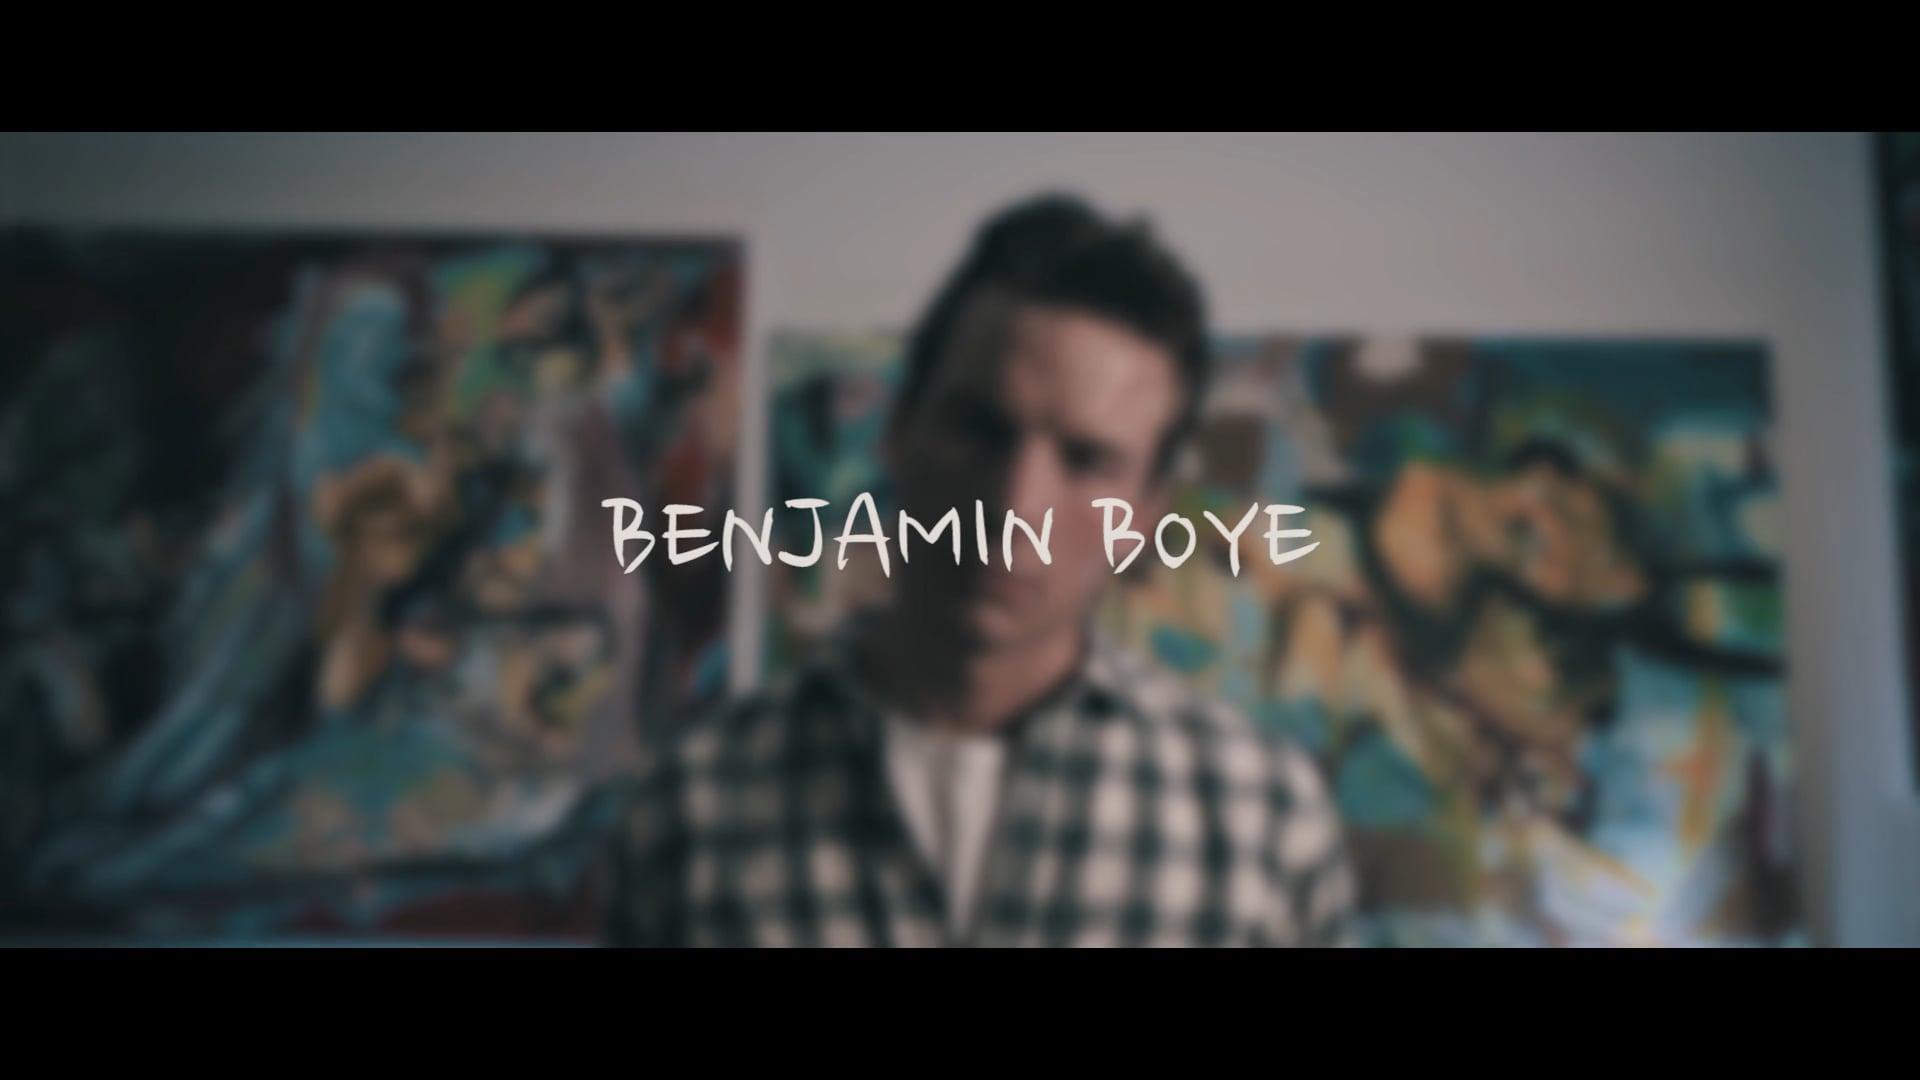 WE ARE ALL ART - Benjamin Boye